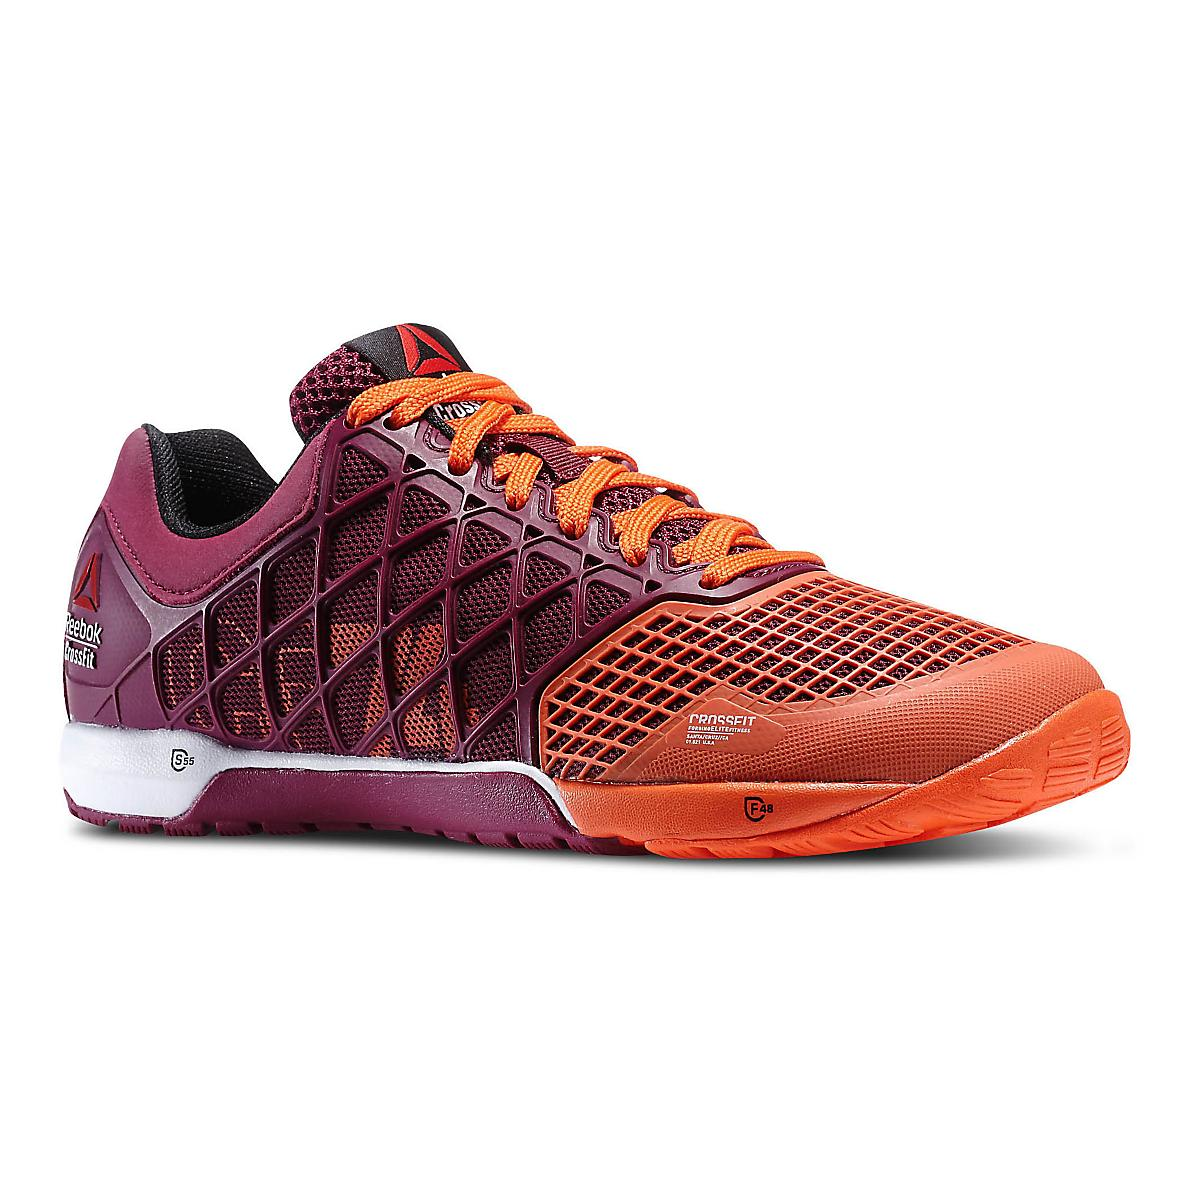 c5c5dde12cde25 Womens Reebok CrossFit Nano 4.0 Cross Training Shoe at Road Runner Sports